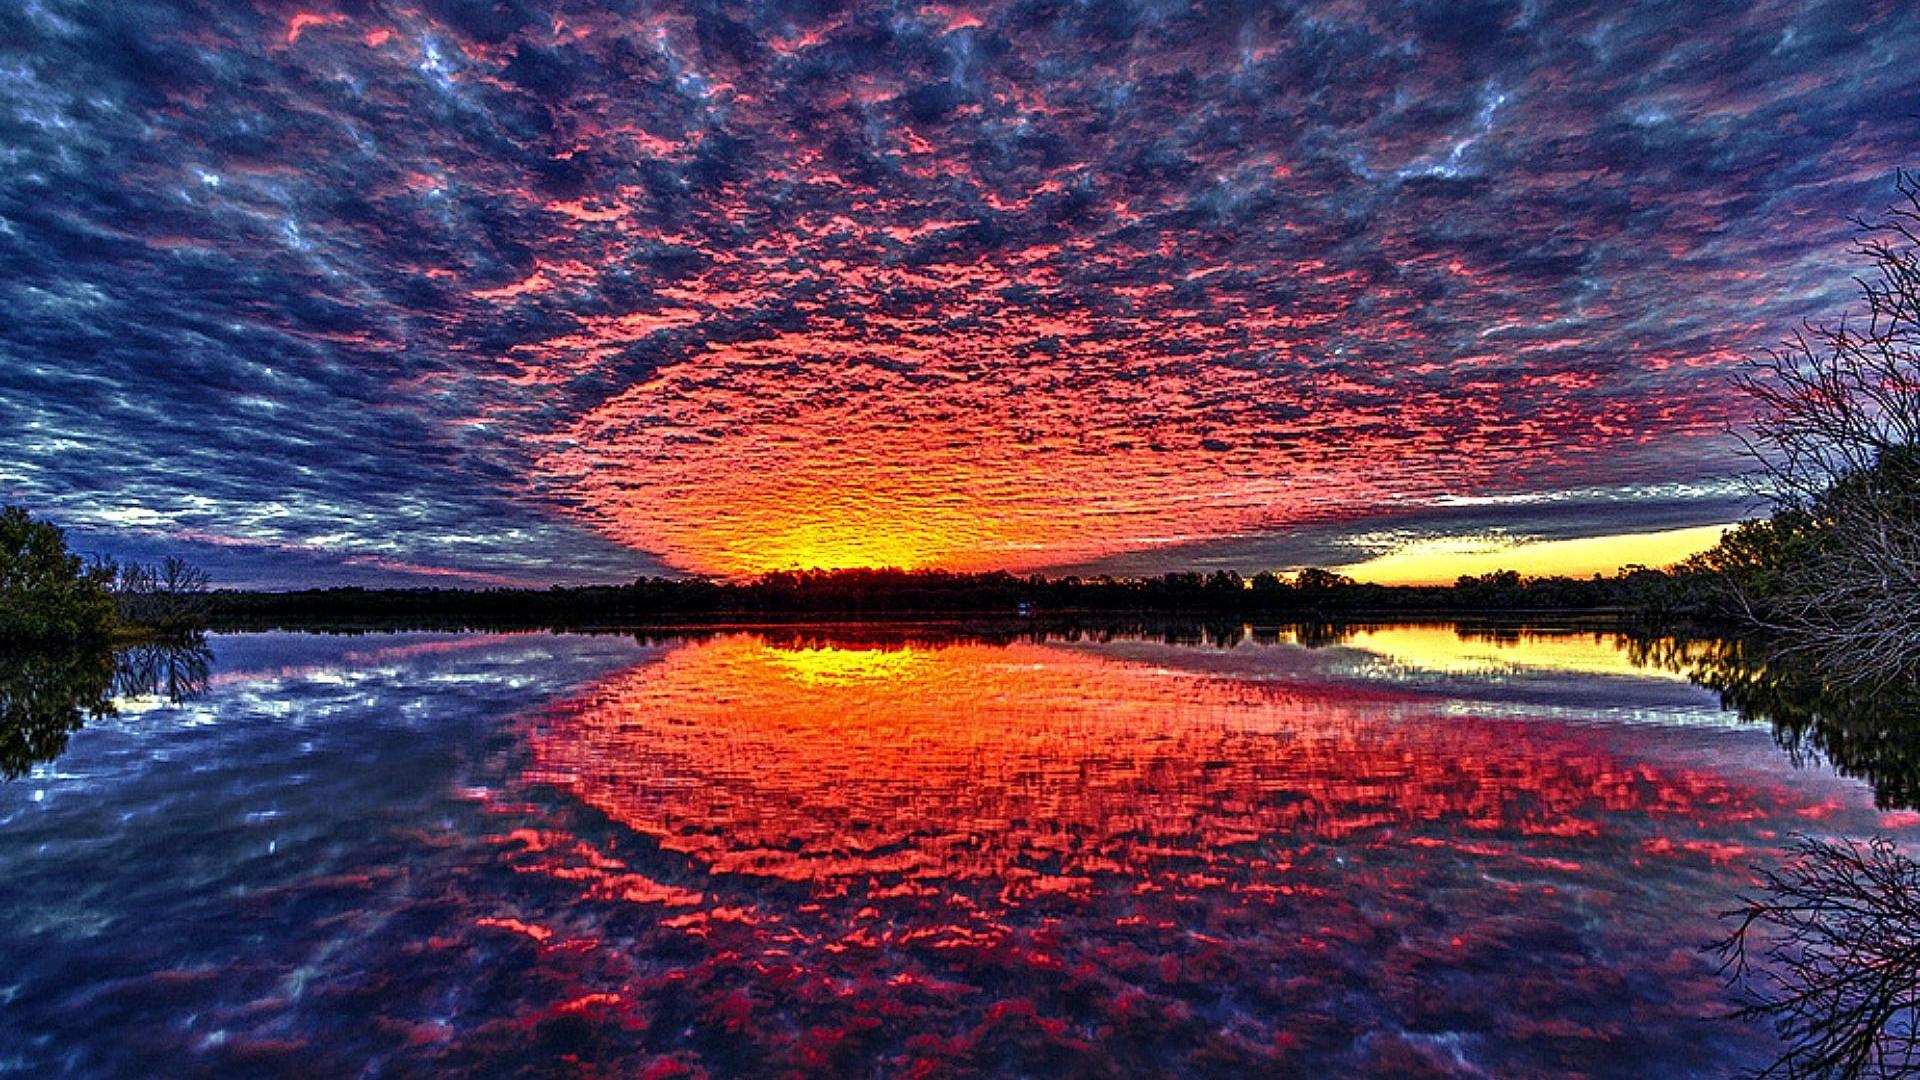 Stunning Hdr Wallpaper 1920x1080 8048 Sunset Photos Sunset Wallpaper Amazing Photography